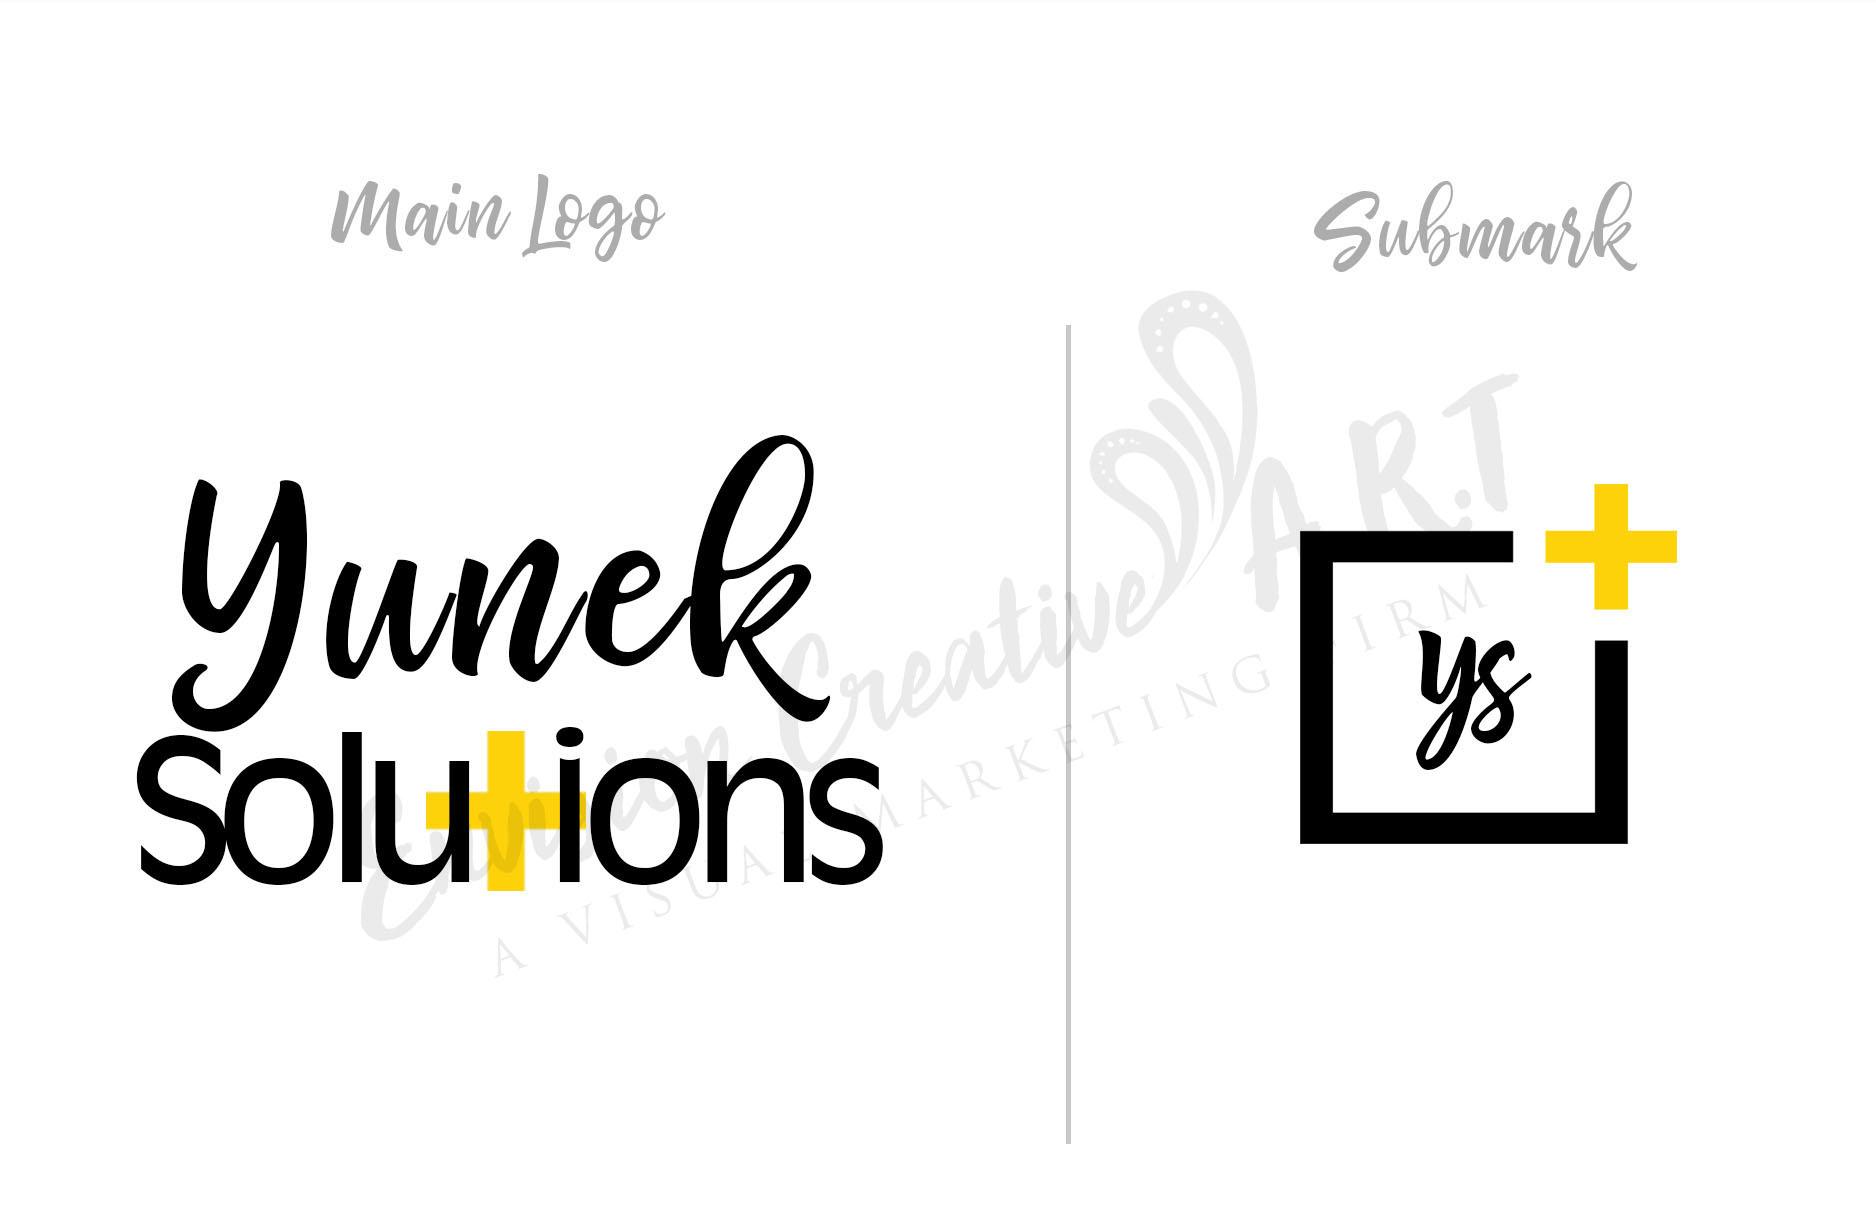 Yunek Solutions_Logo_1B+Submark